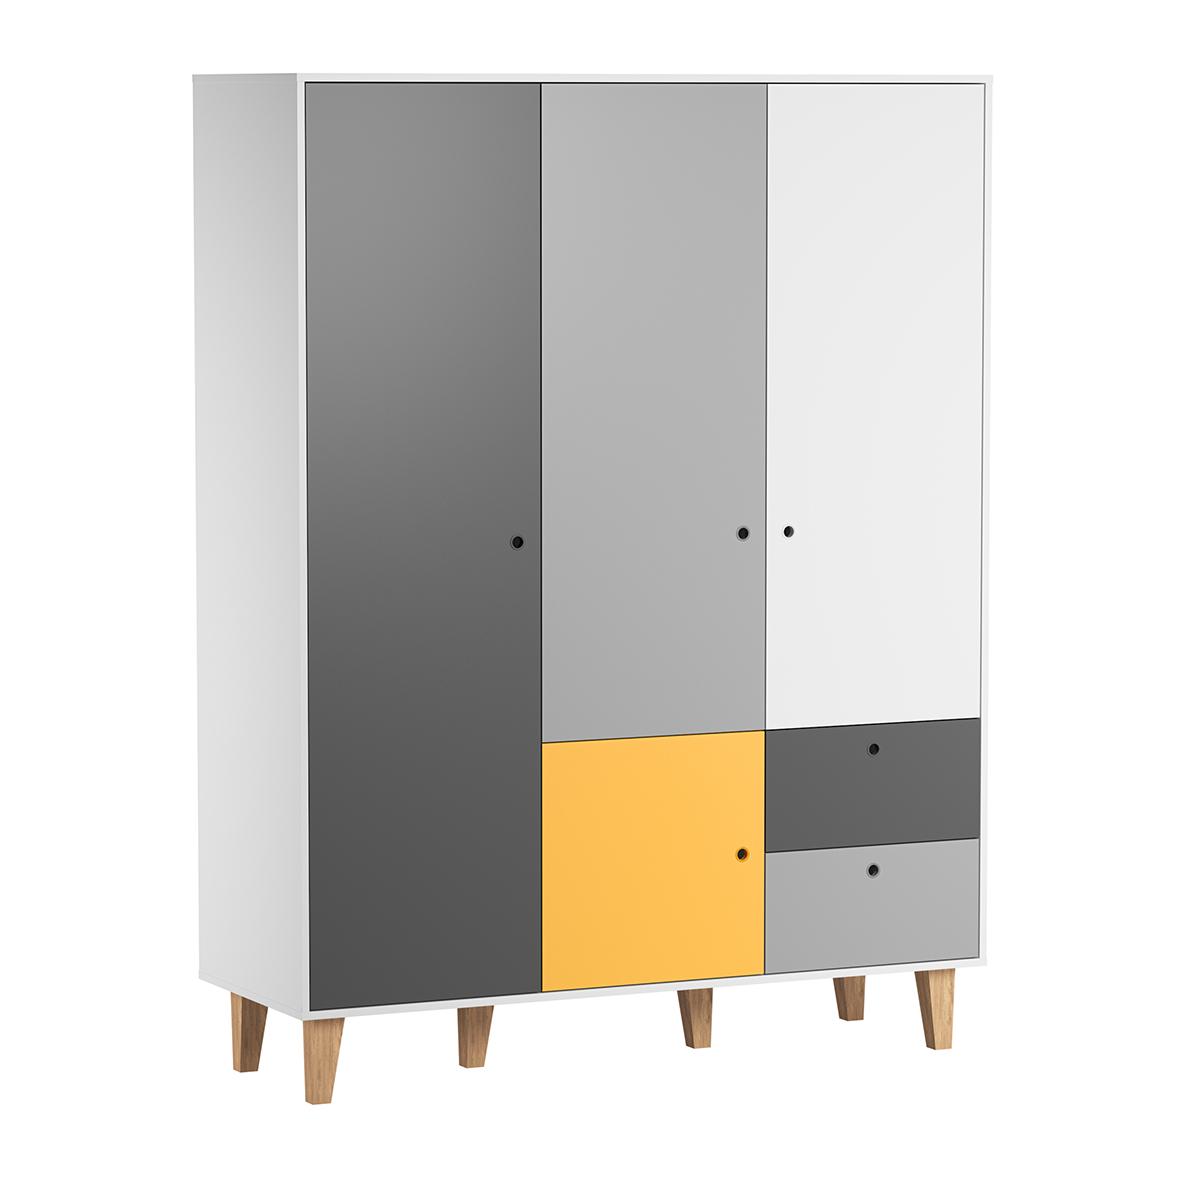 Armoire 3 portes Vox Concept - Jaune